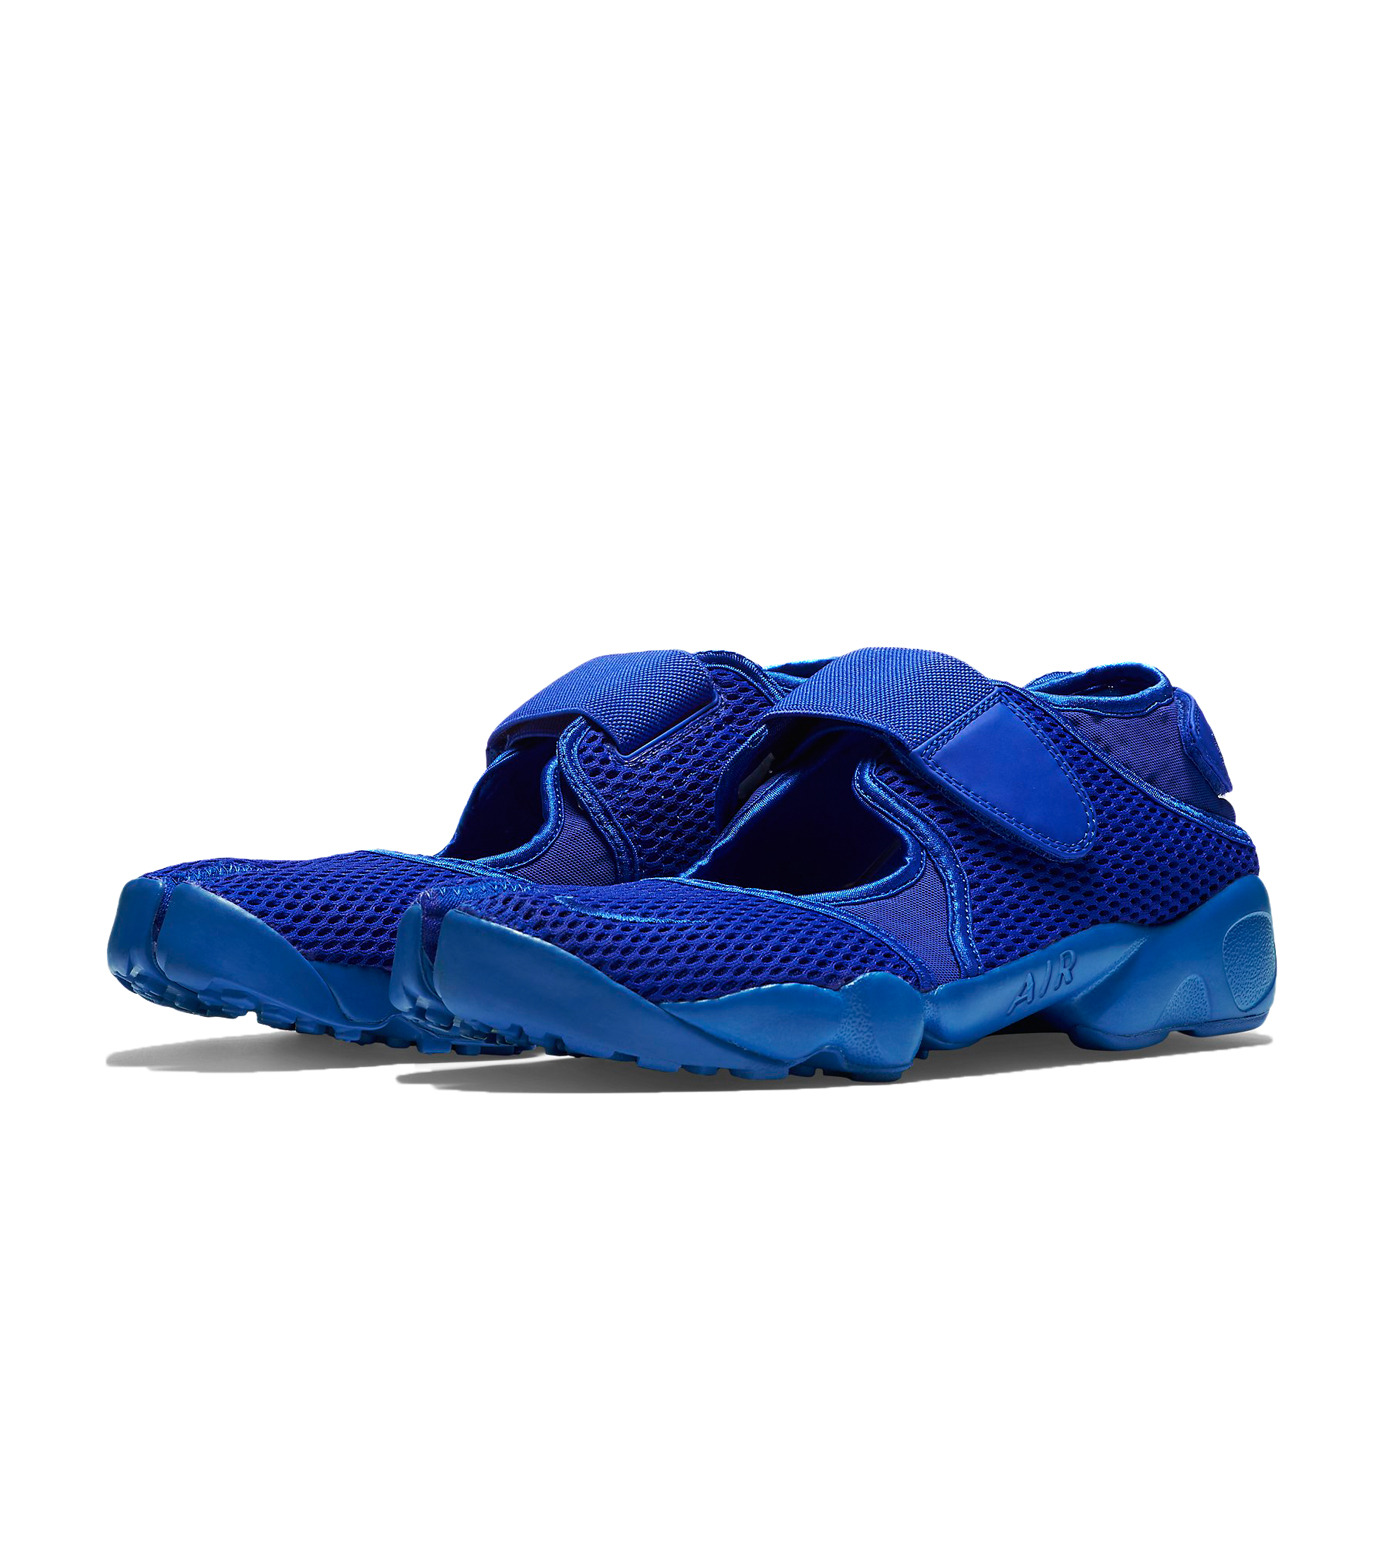 NIKE(ナイキ)のAir Rift Breathe-BLUE(シューズ/shoes)-847609-400-92 拡大詳細画像4